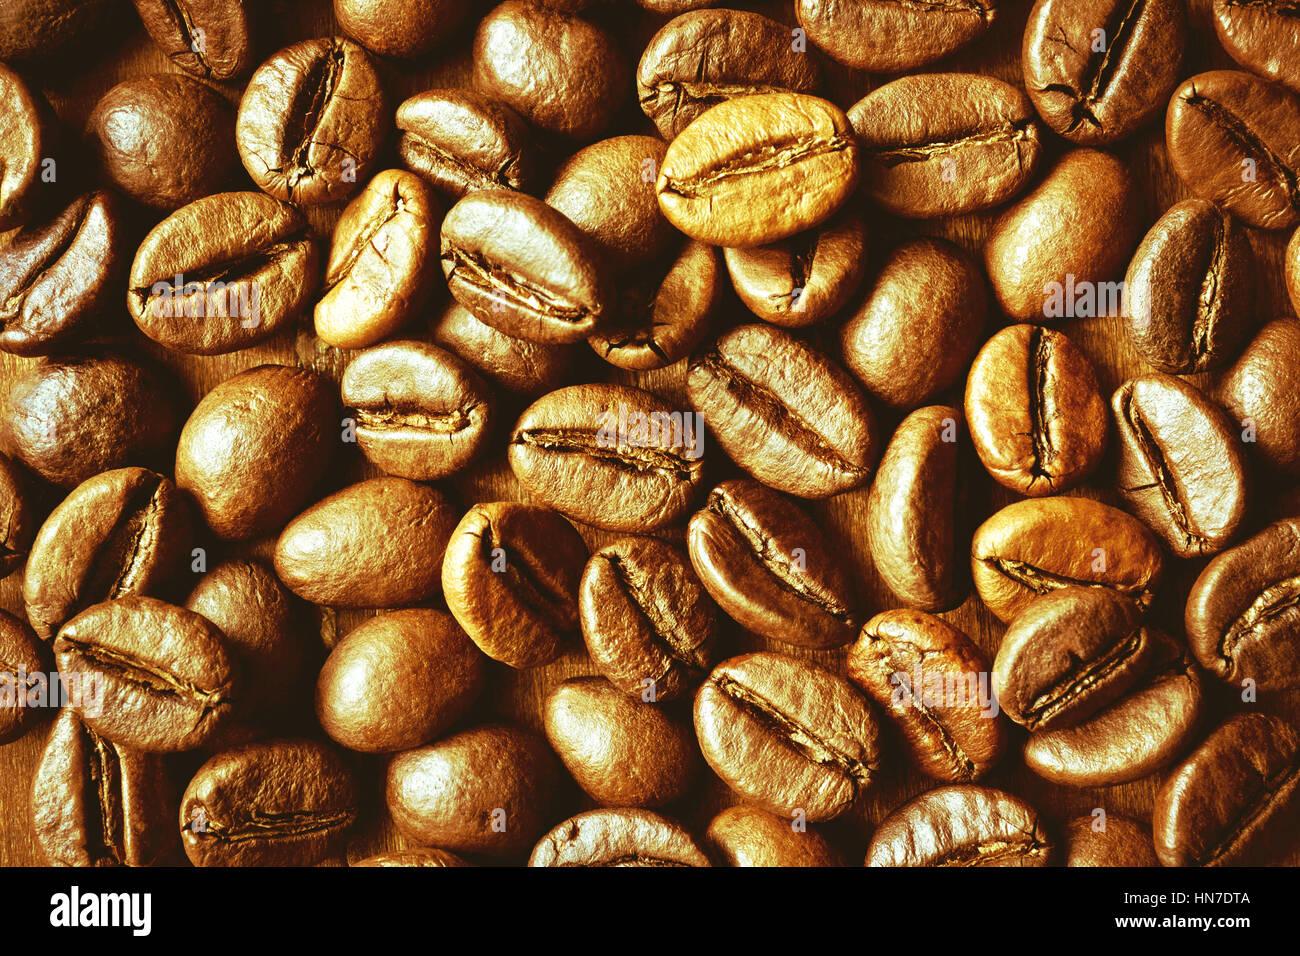 Coffee bean background - Stock Image